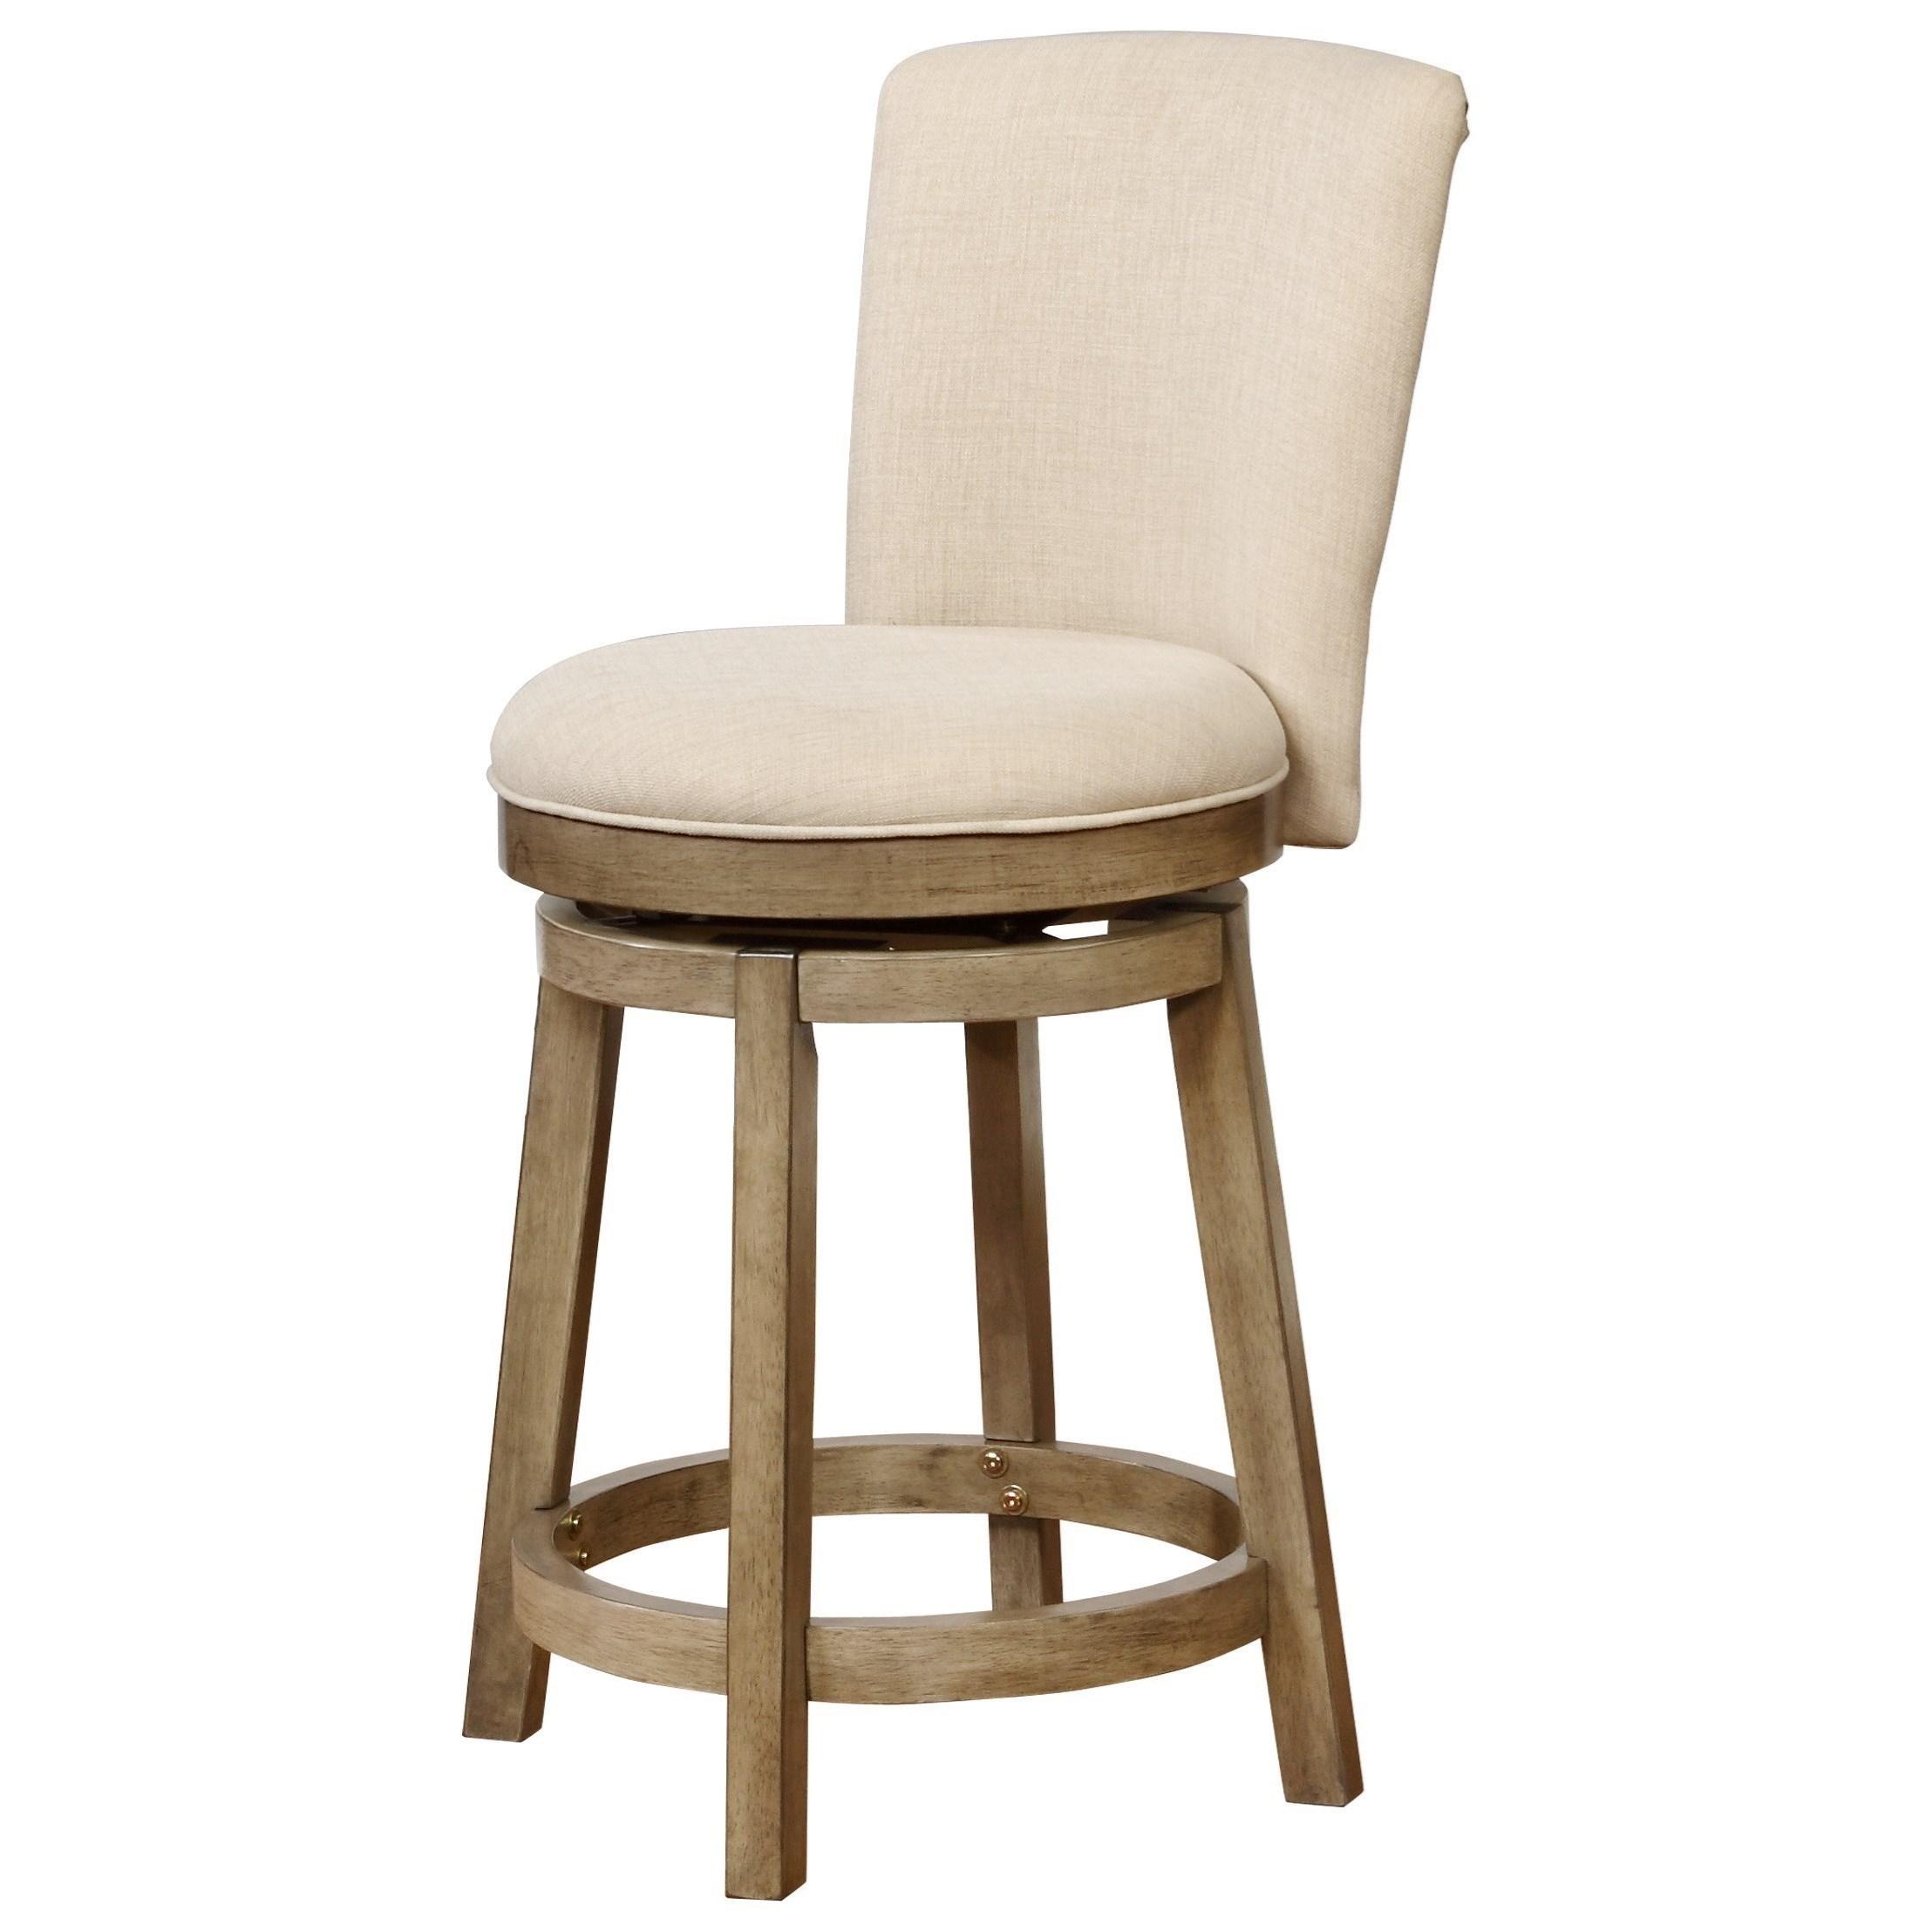 powell bar stools tables davis upholstered counterstool wayside furniture bar stools. Black Bedroom Furniture Sets. Home Design Ideas